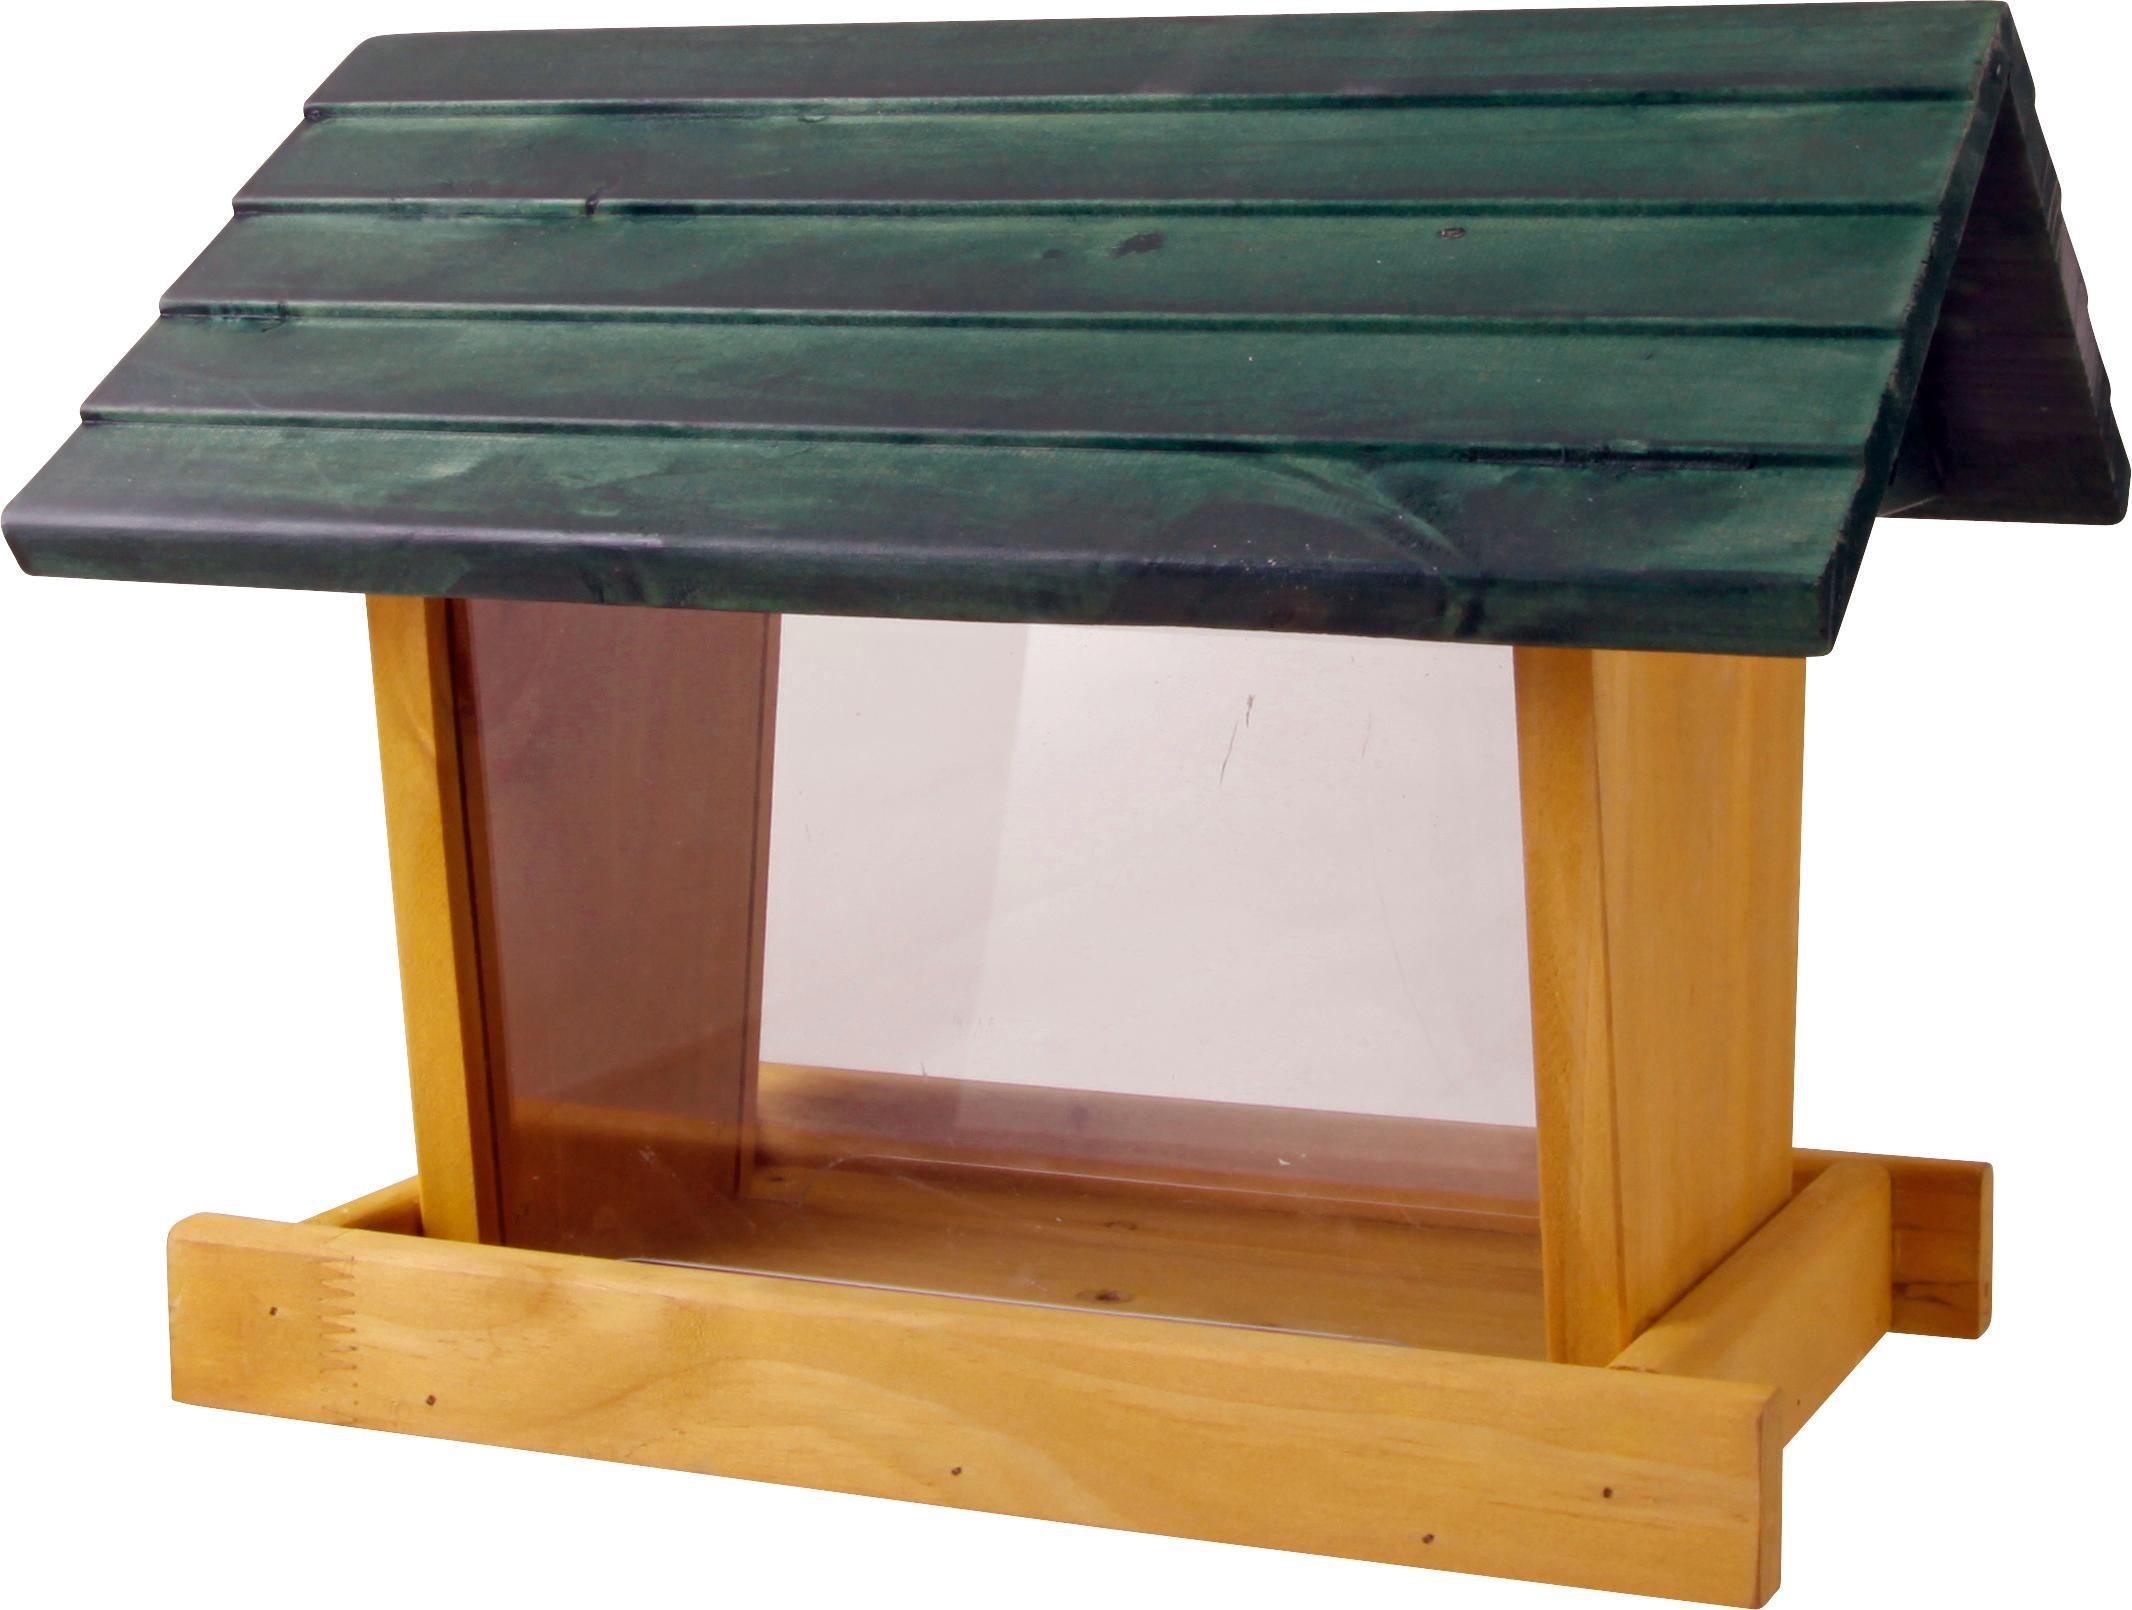 Fågelmatare Granngården Grön stuga Frö, 3,5 l